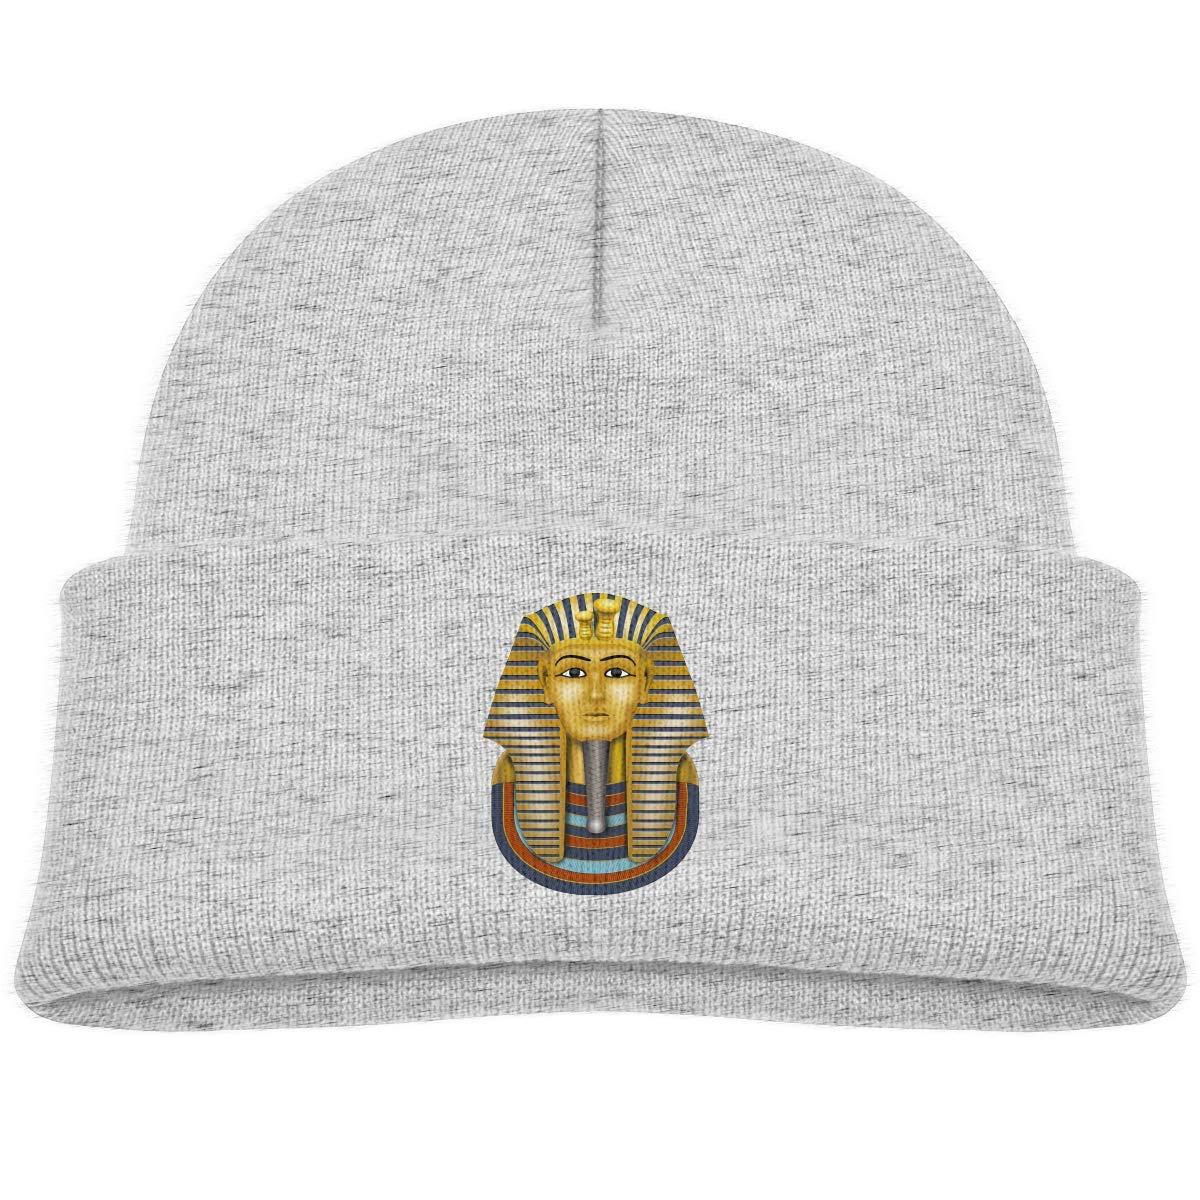 Daibing Kids Knitted Beanies Hat Egyptian Tutankhamon King TUT Winter Hat Knitted Skull Cap